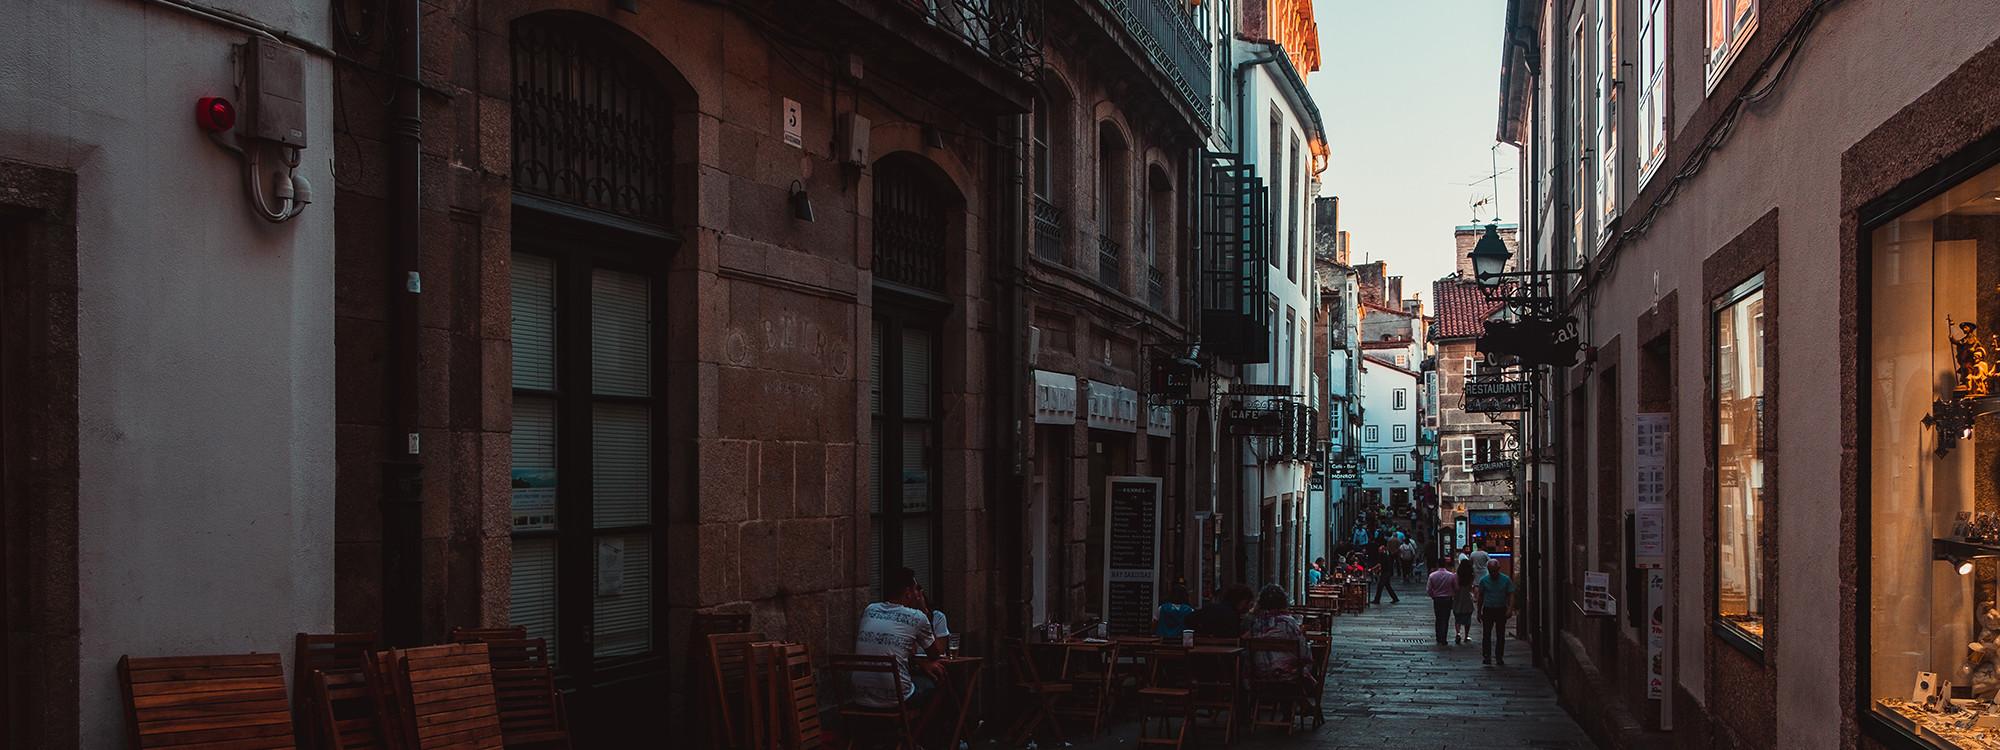 Streets in Santiago